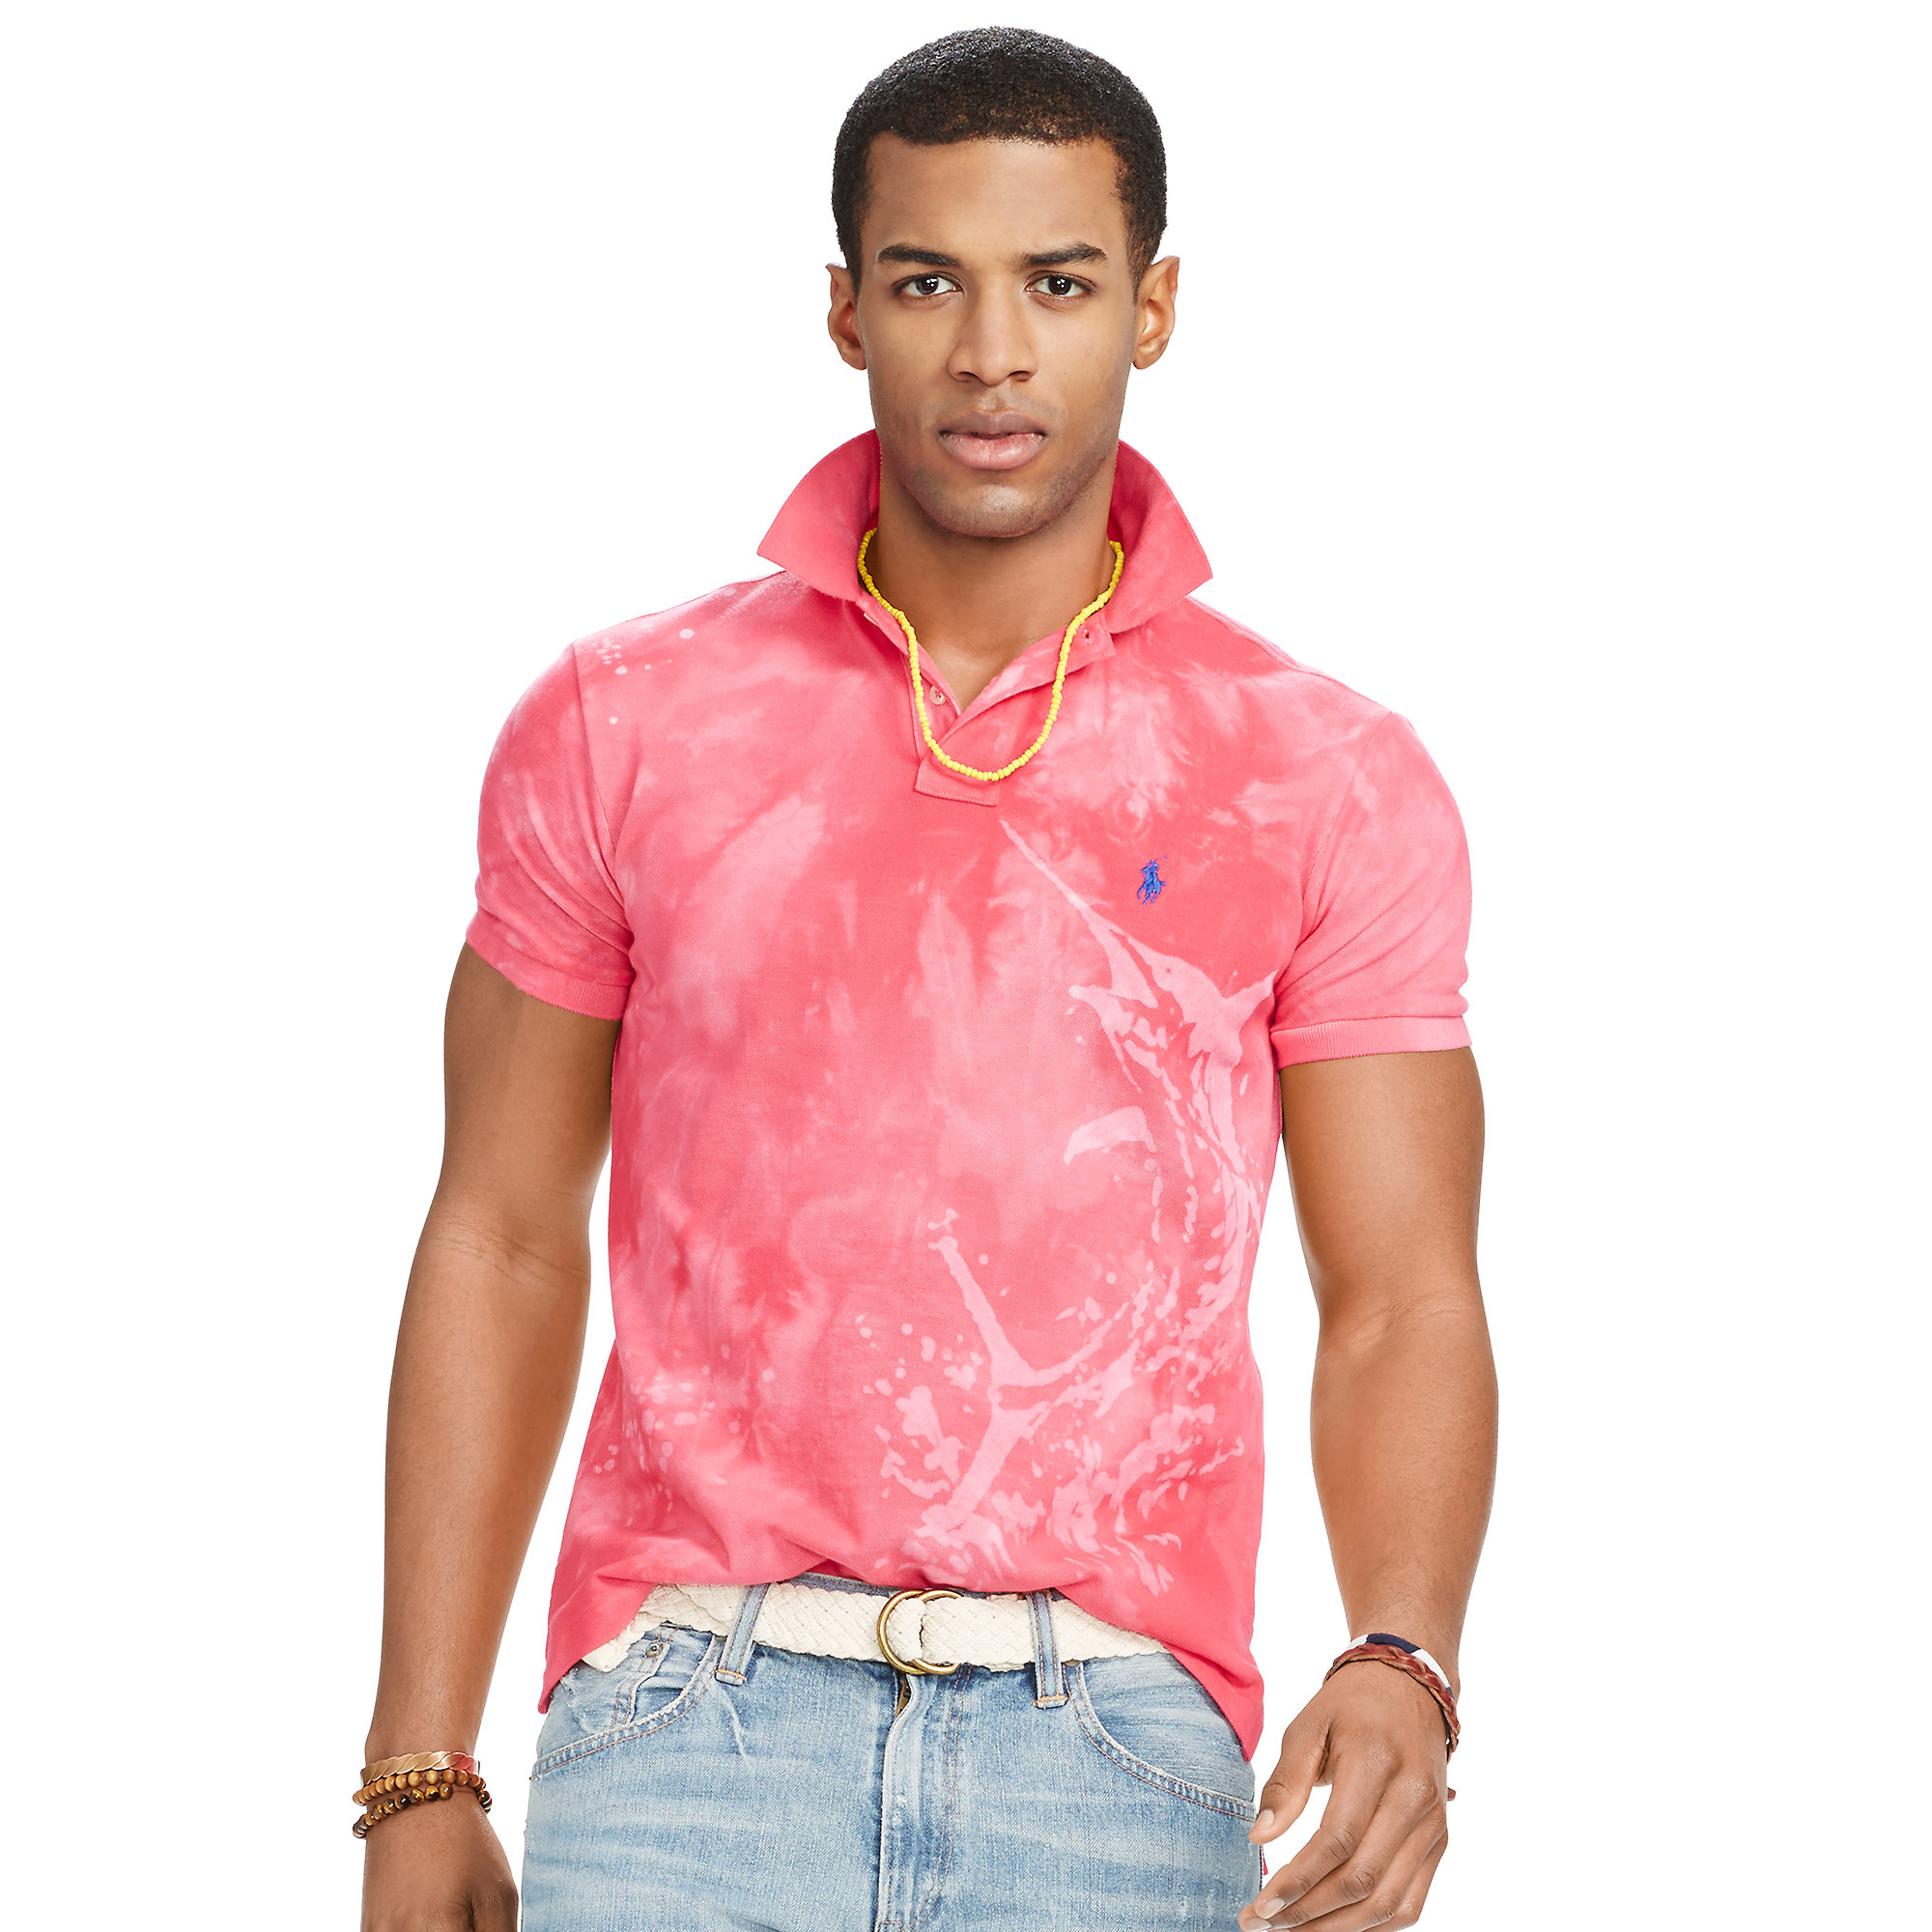 Lyst Polo Ralph Lauren Marlin Mesh Polo Shirt In Pink For Men